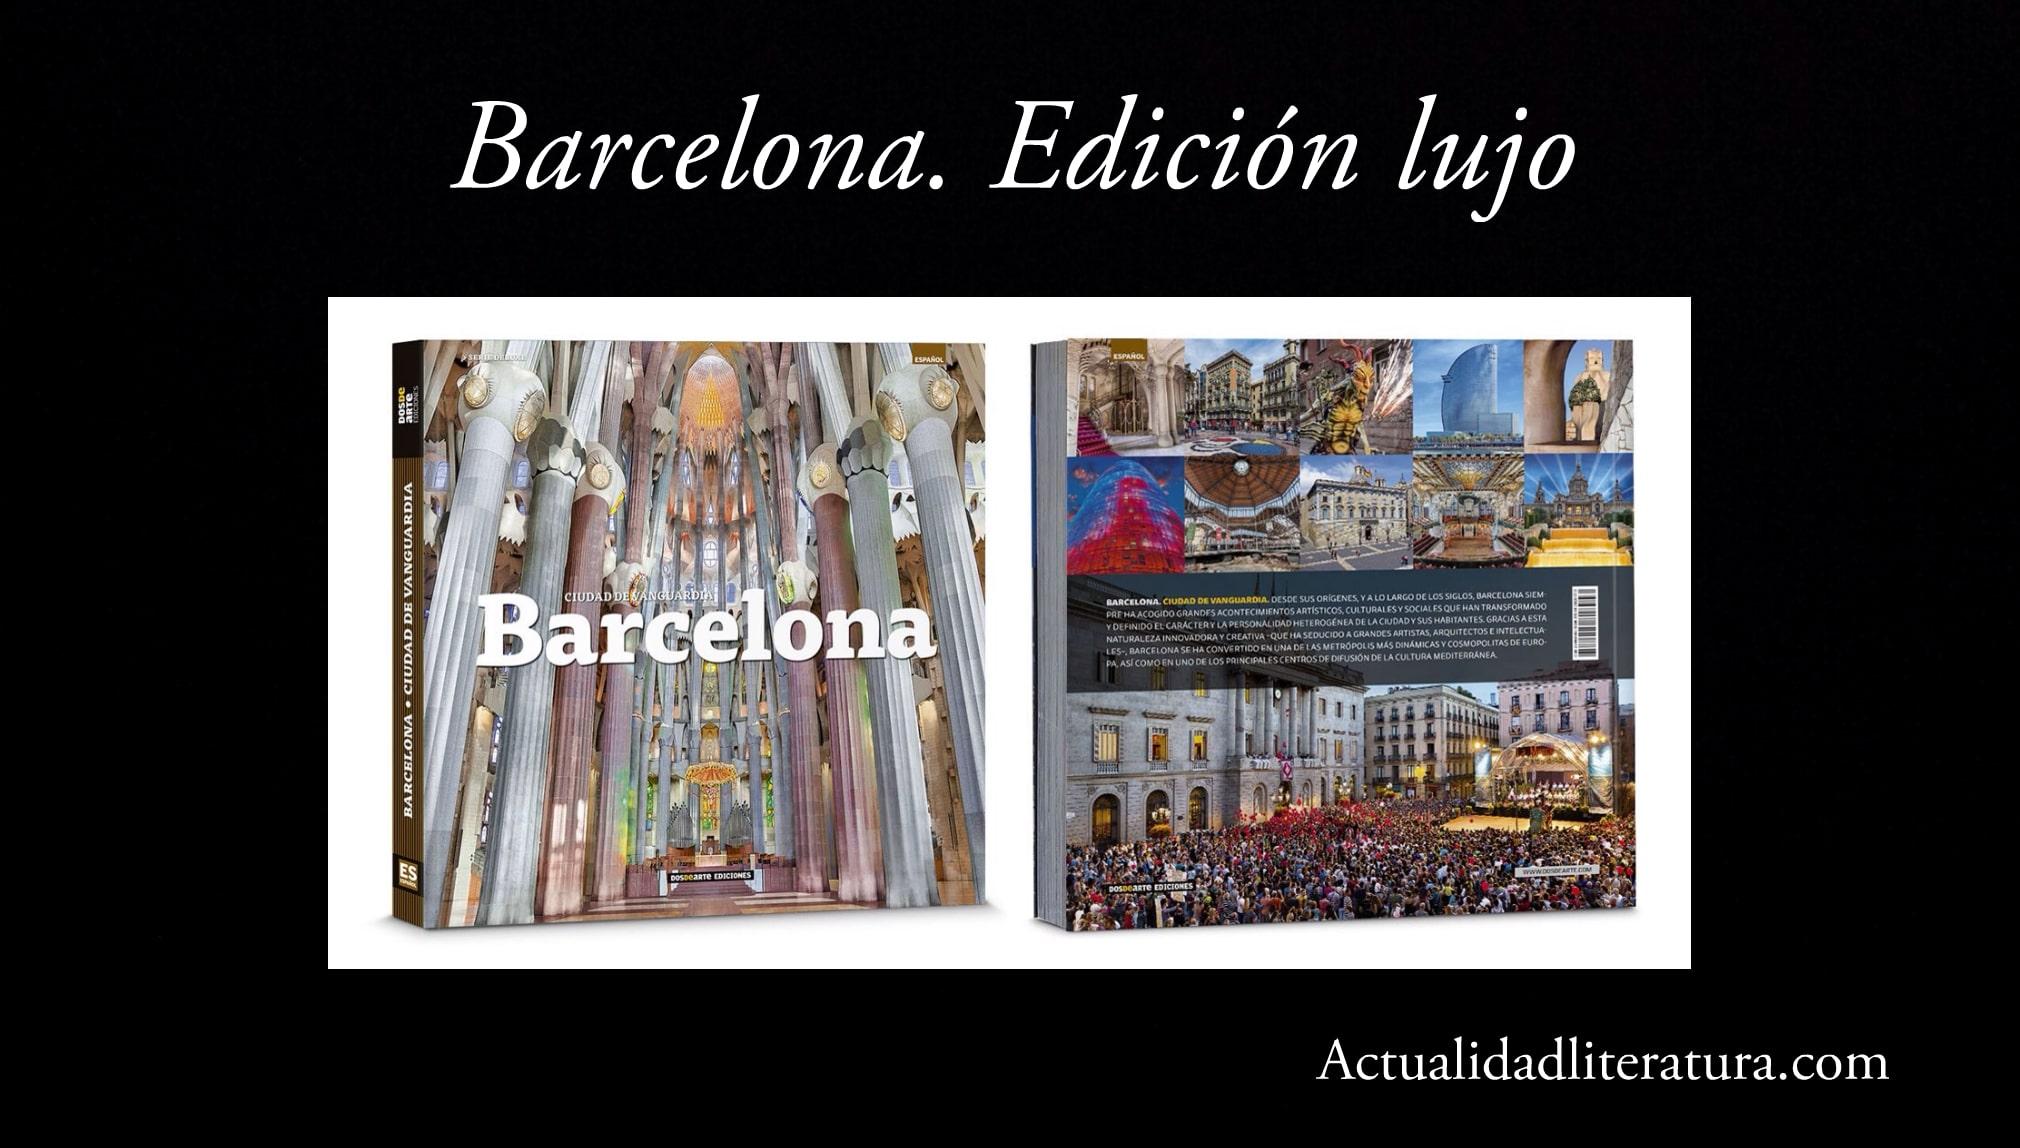 Barcelona. Edicion lujo